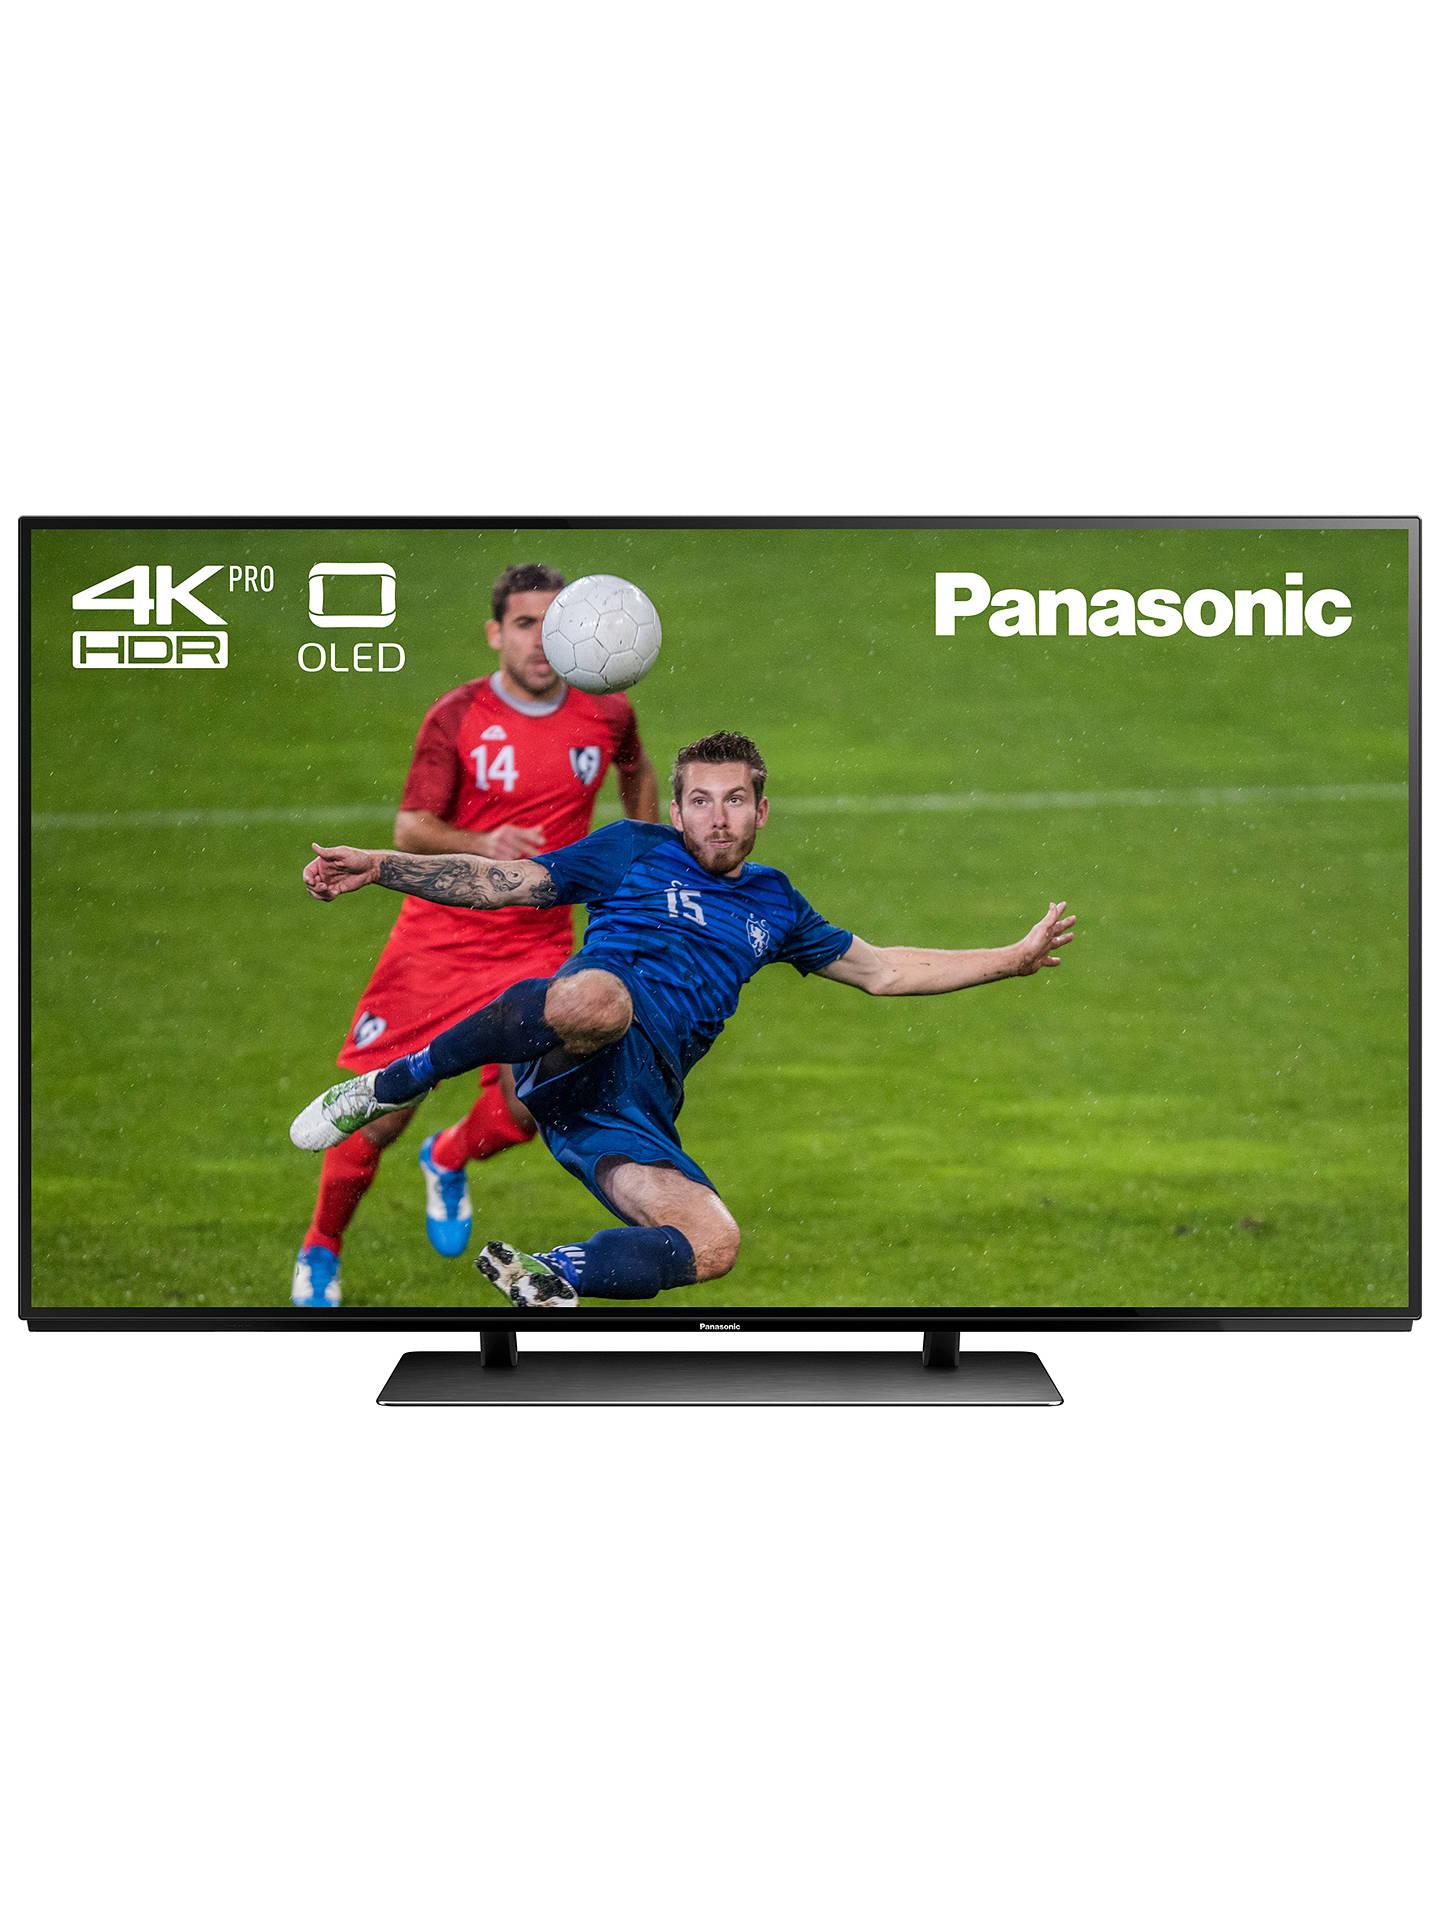 Panasonic TX-55EZ952B OLED HDR 4K Ultra HD Smart TV, 55